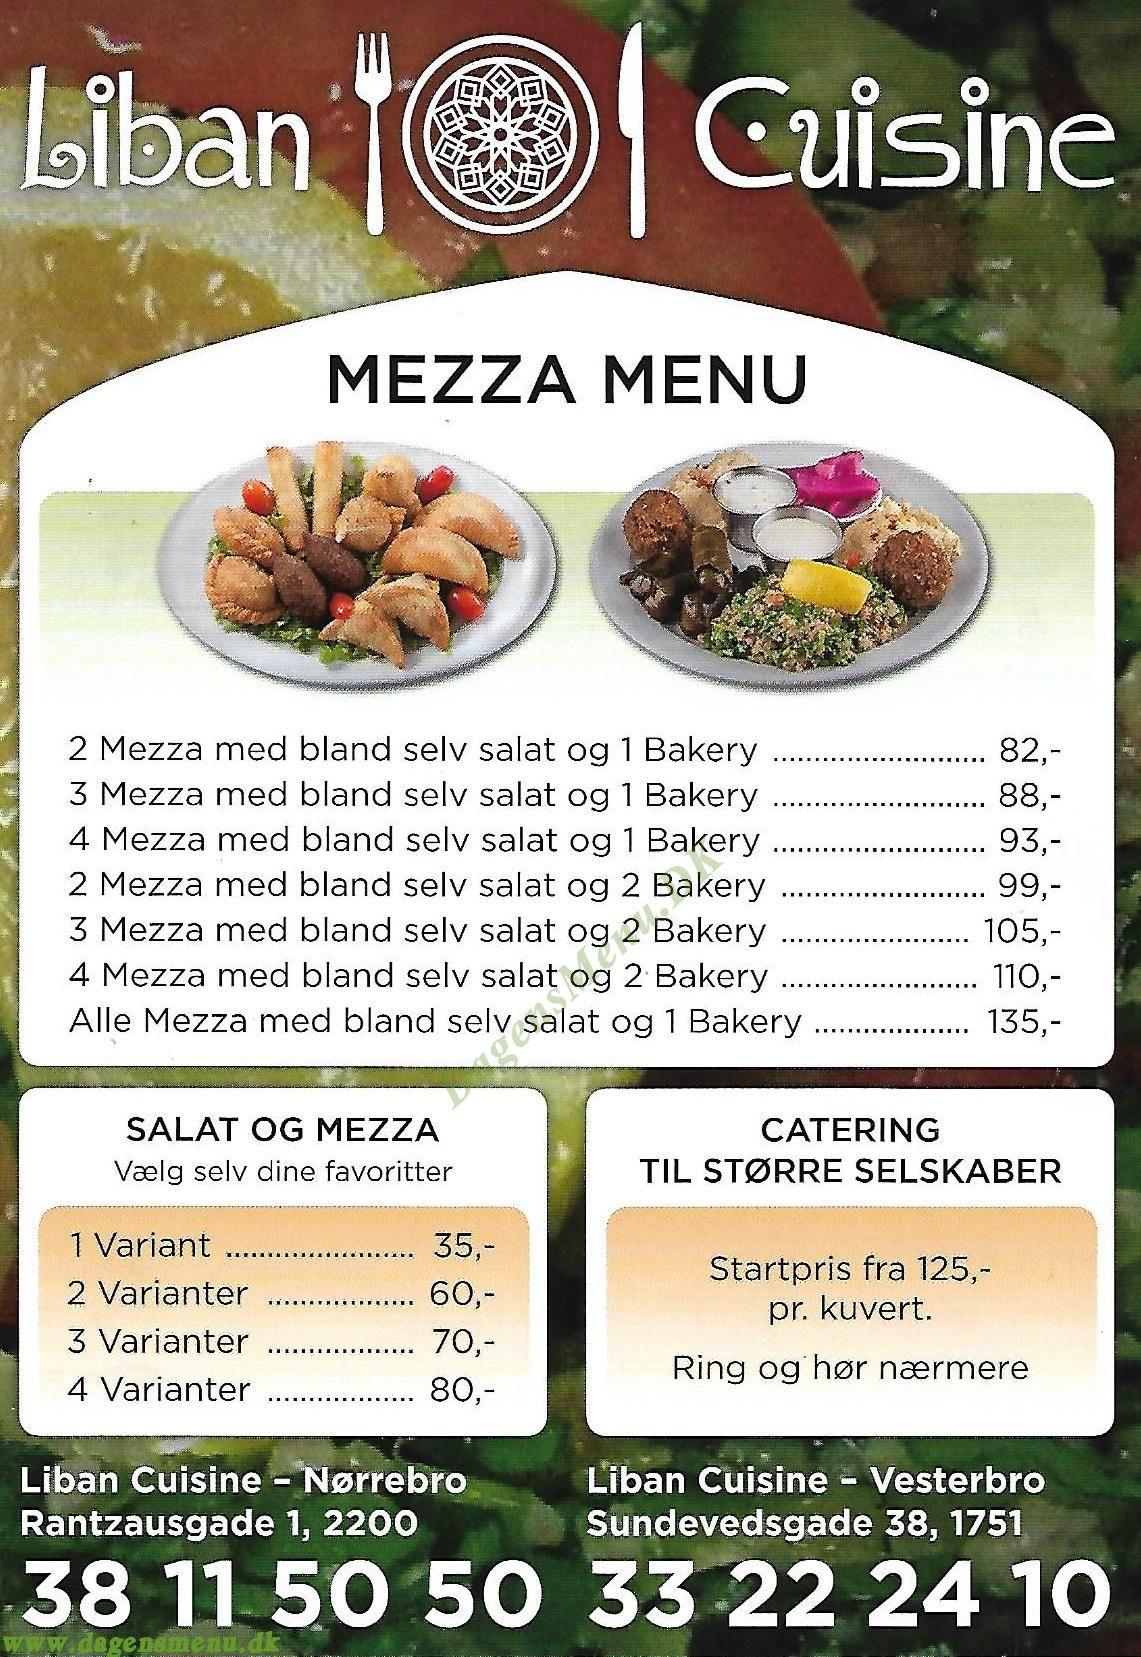 Liban Cuisine Nørrebro - Menukort